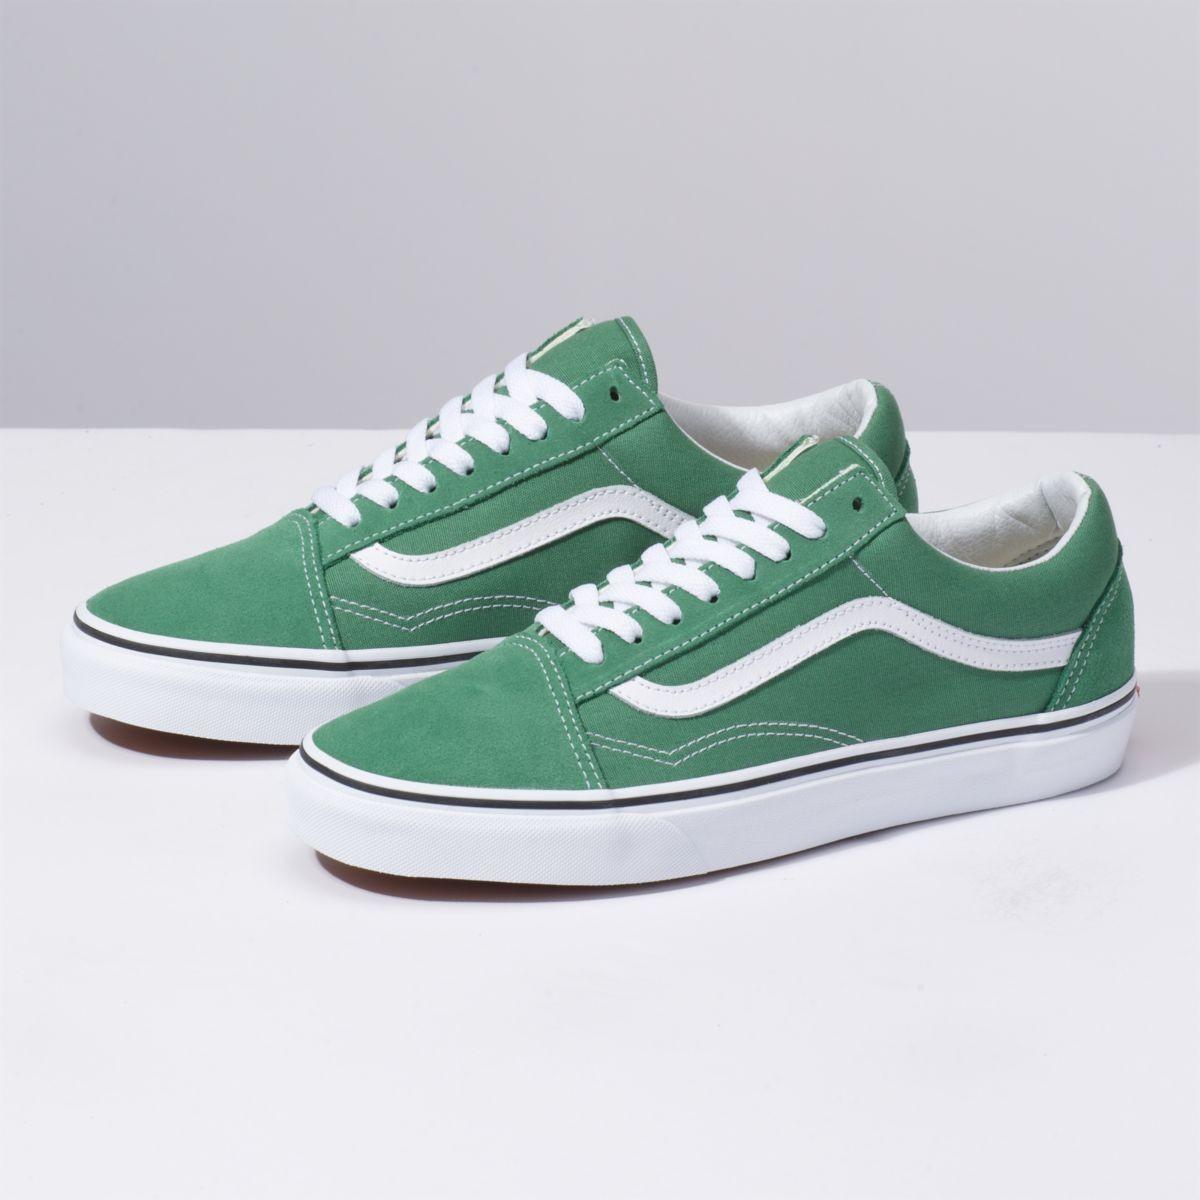 vans verte old skool Shop Clothing & Shoes Online